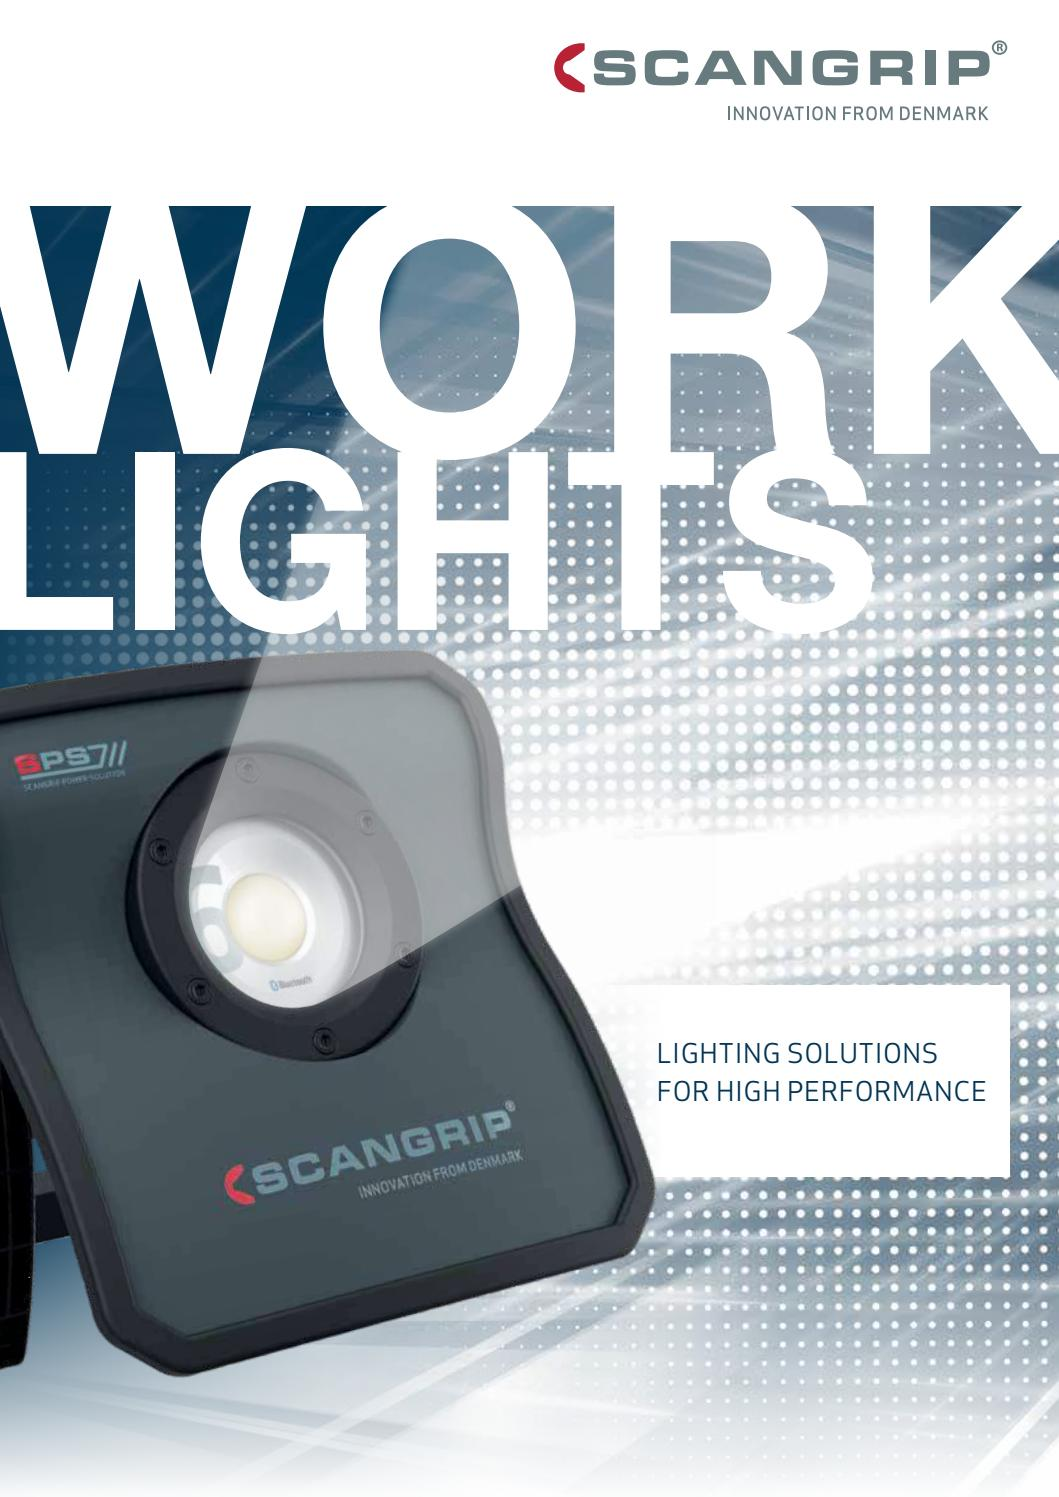 10000 Lumen Multifunction Rechargeable COB LED Slim Work Light Lamp Flashlight M